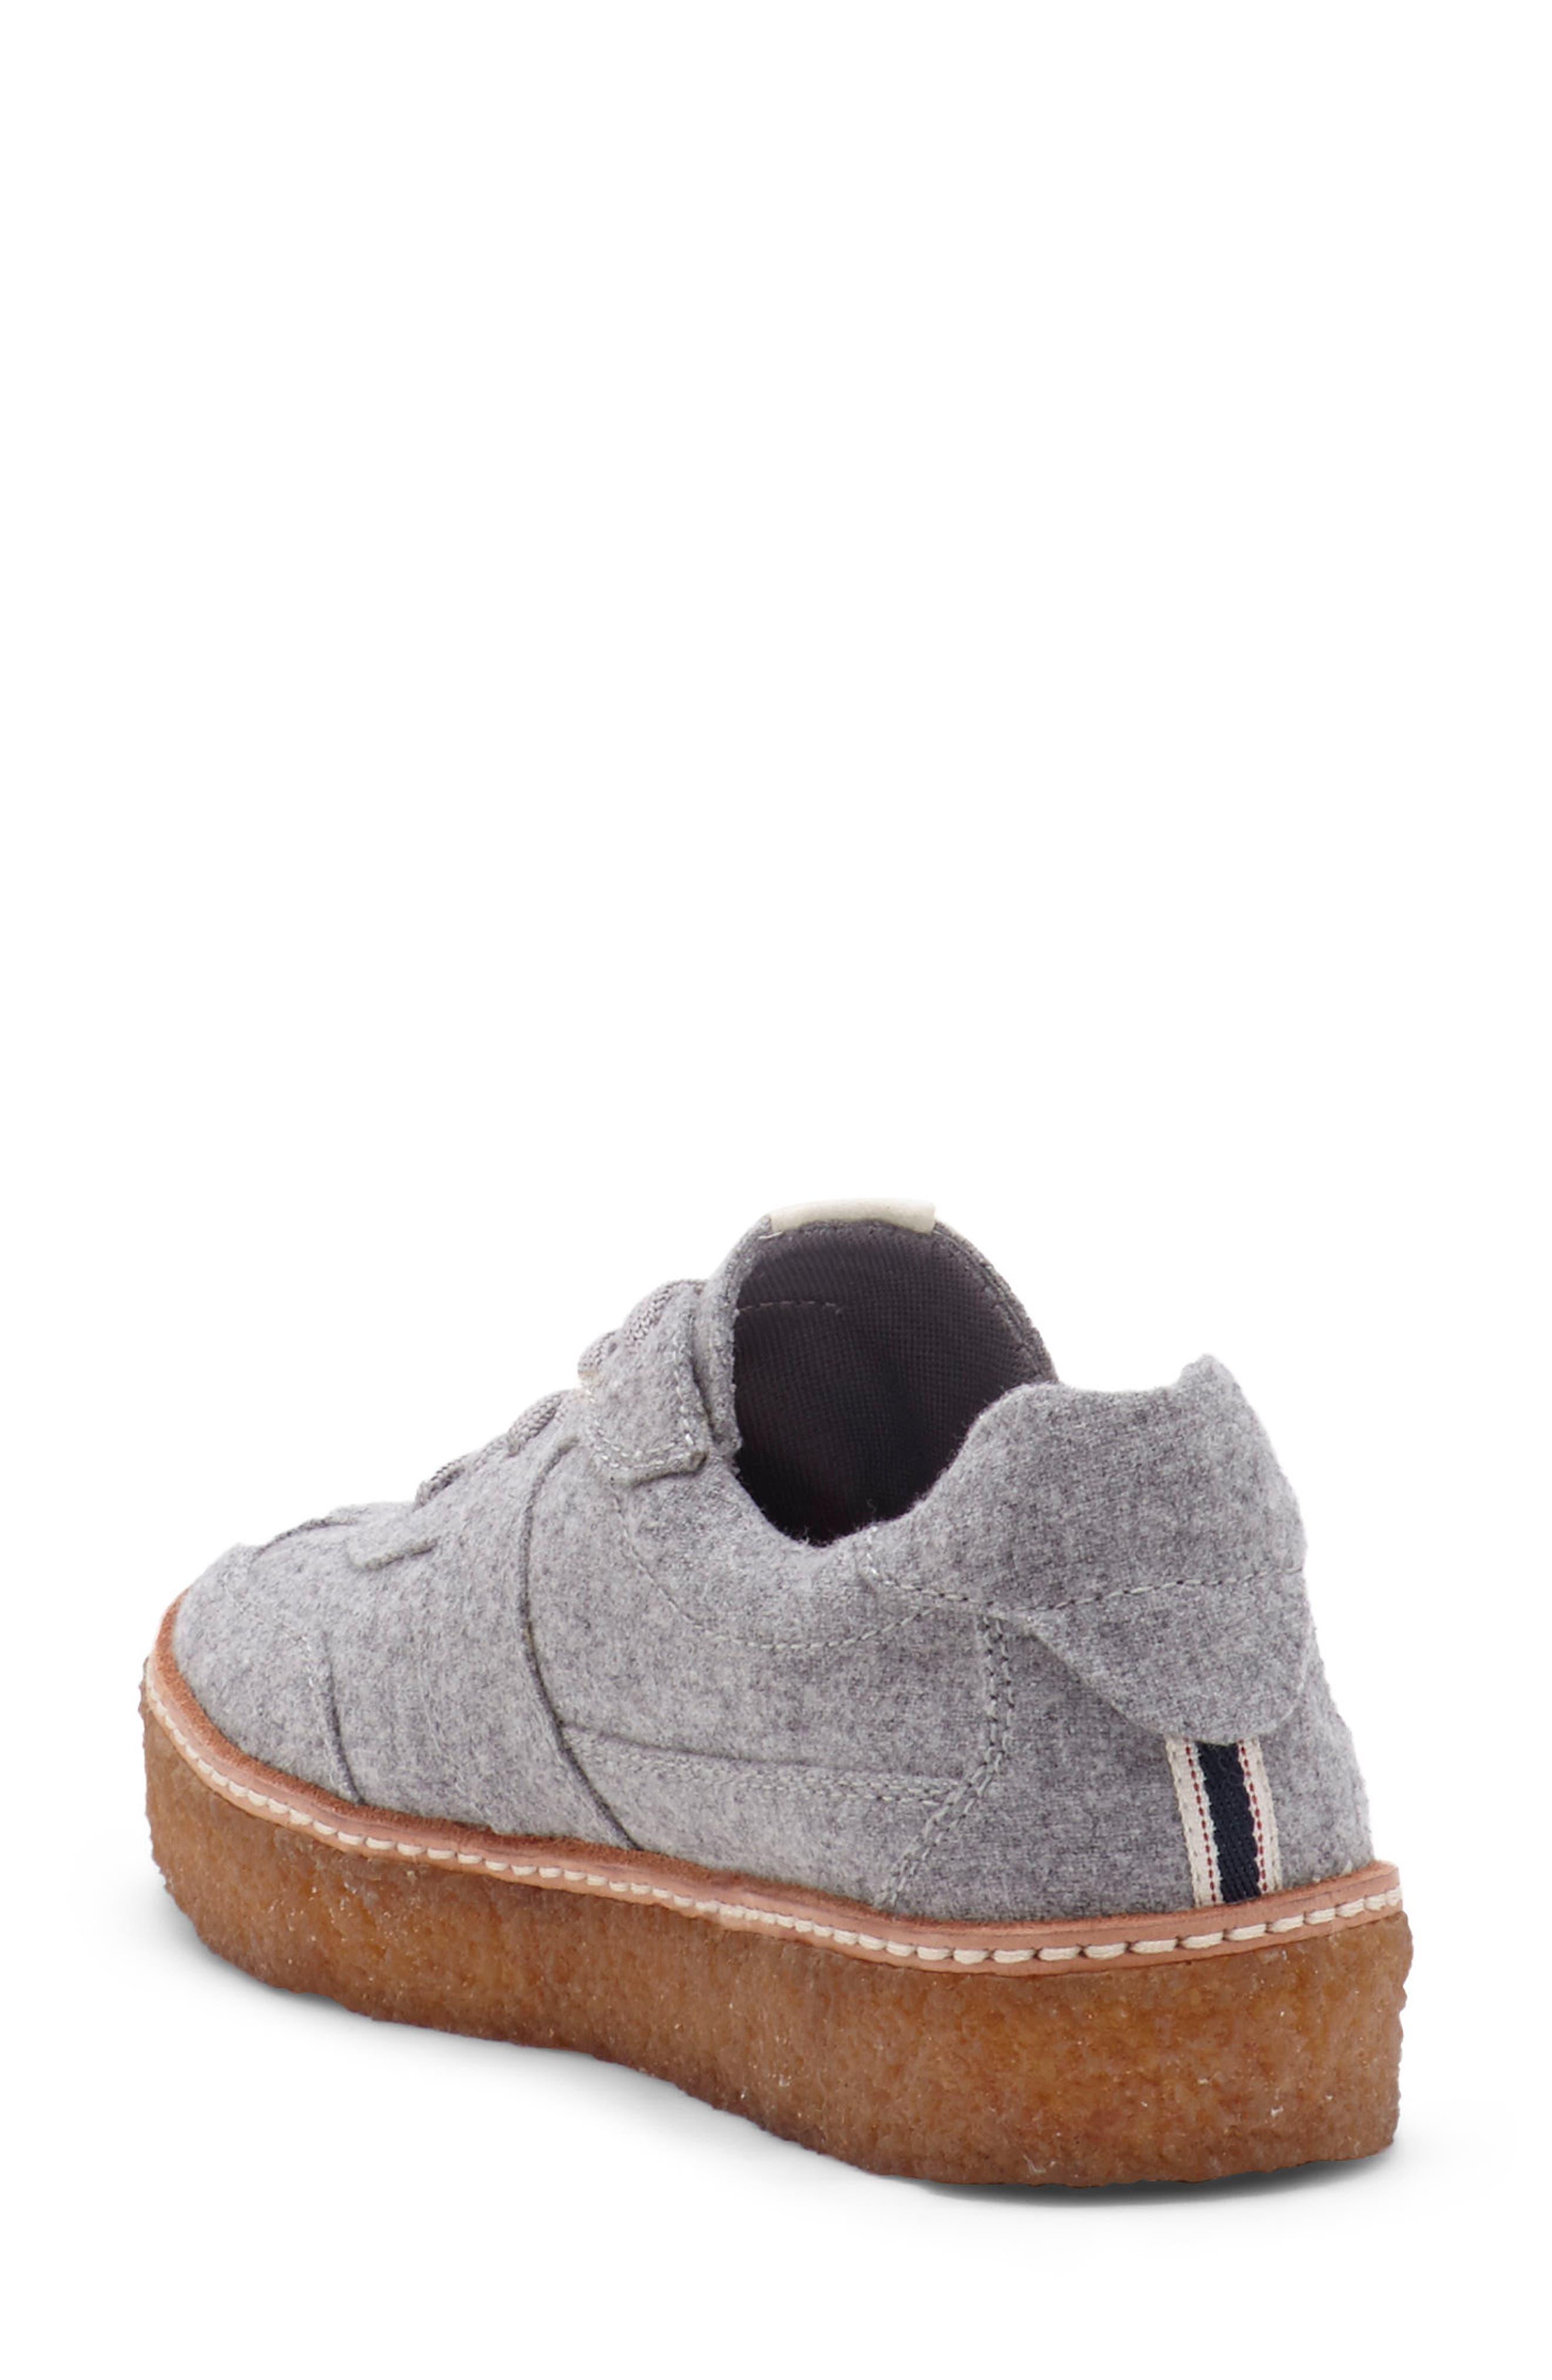 Danby Sneaker,                             Alternate thumbnail 2, color,                             022